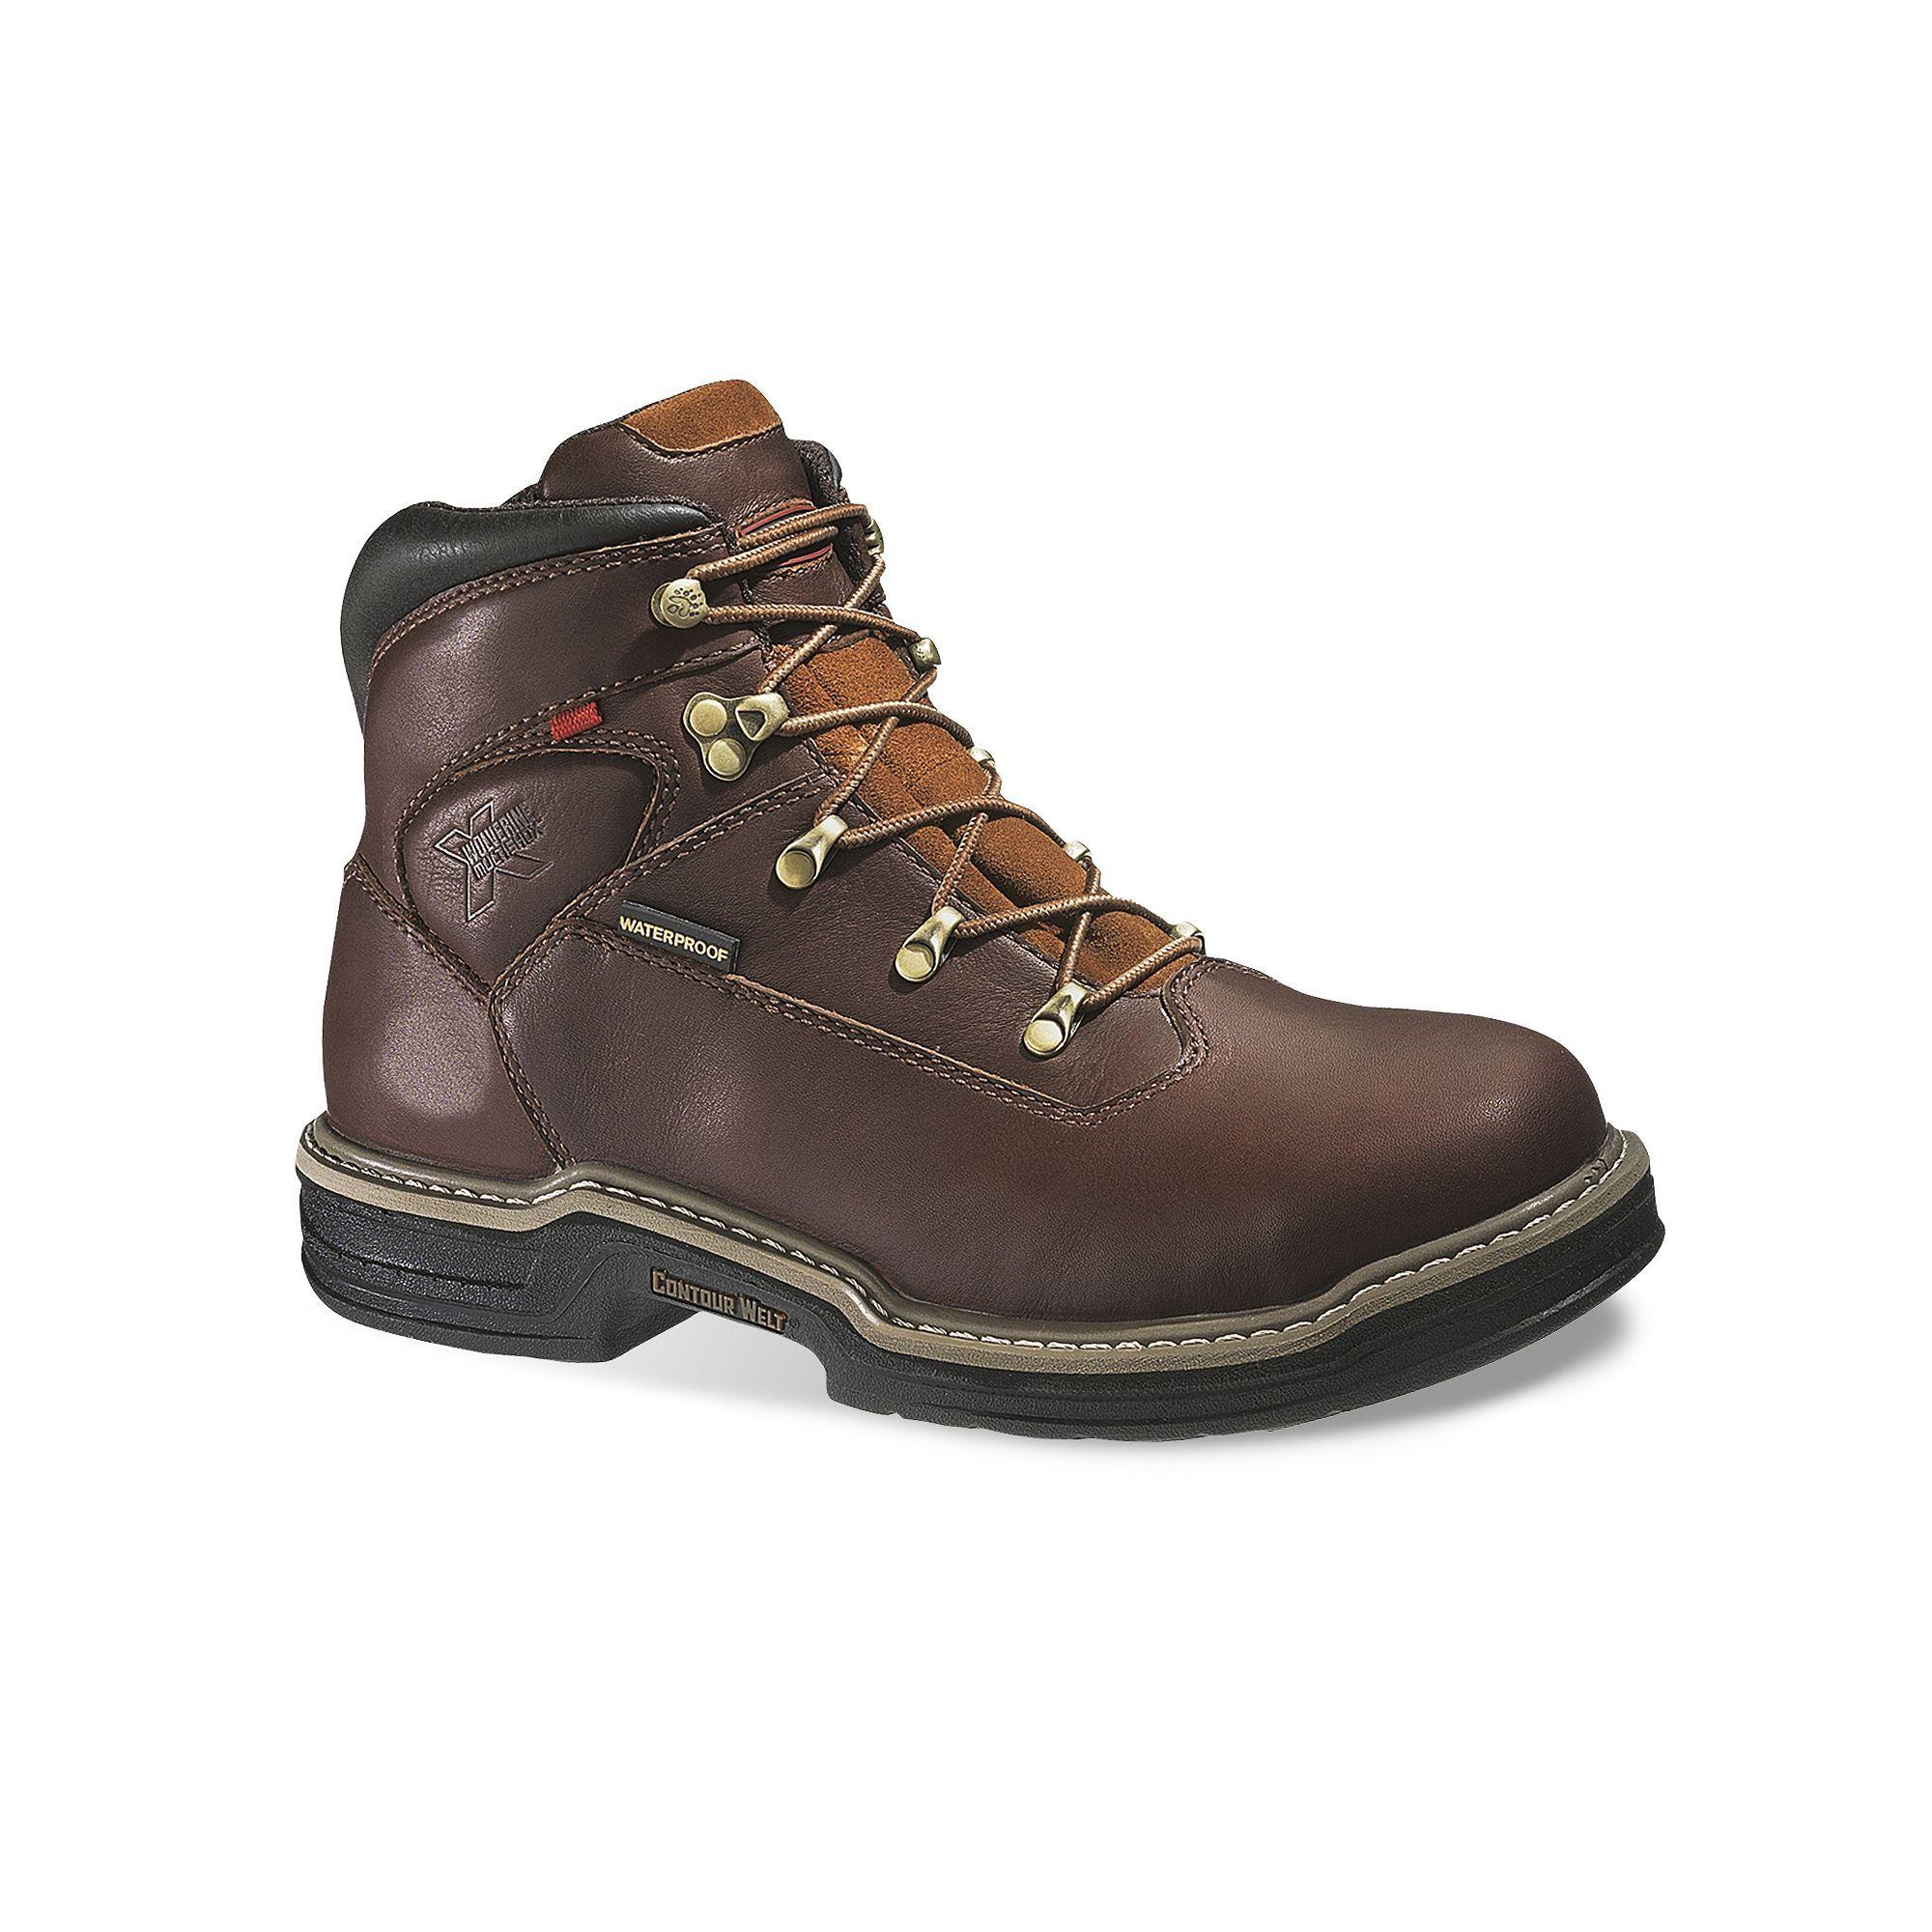 arrives low price cheap for discount Wolverine Buccaneer Men's Waterproof Steel-Toe Work Boots   Steel ...